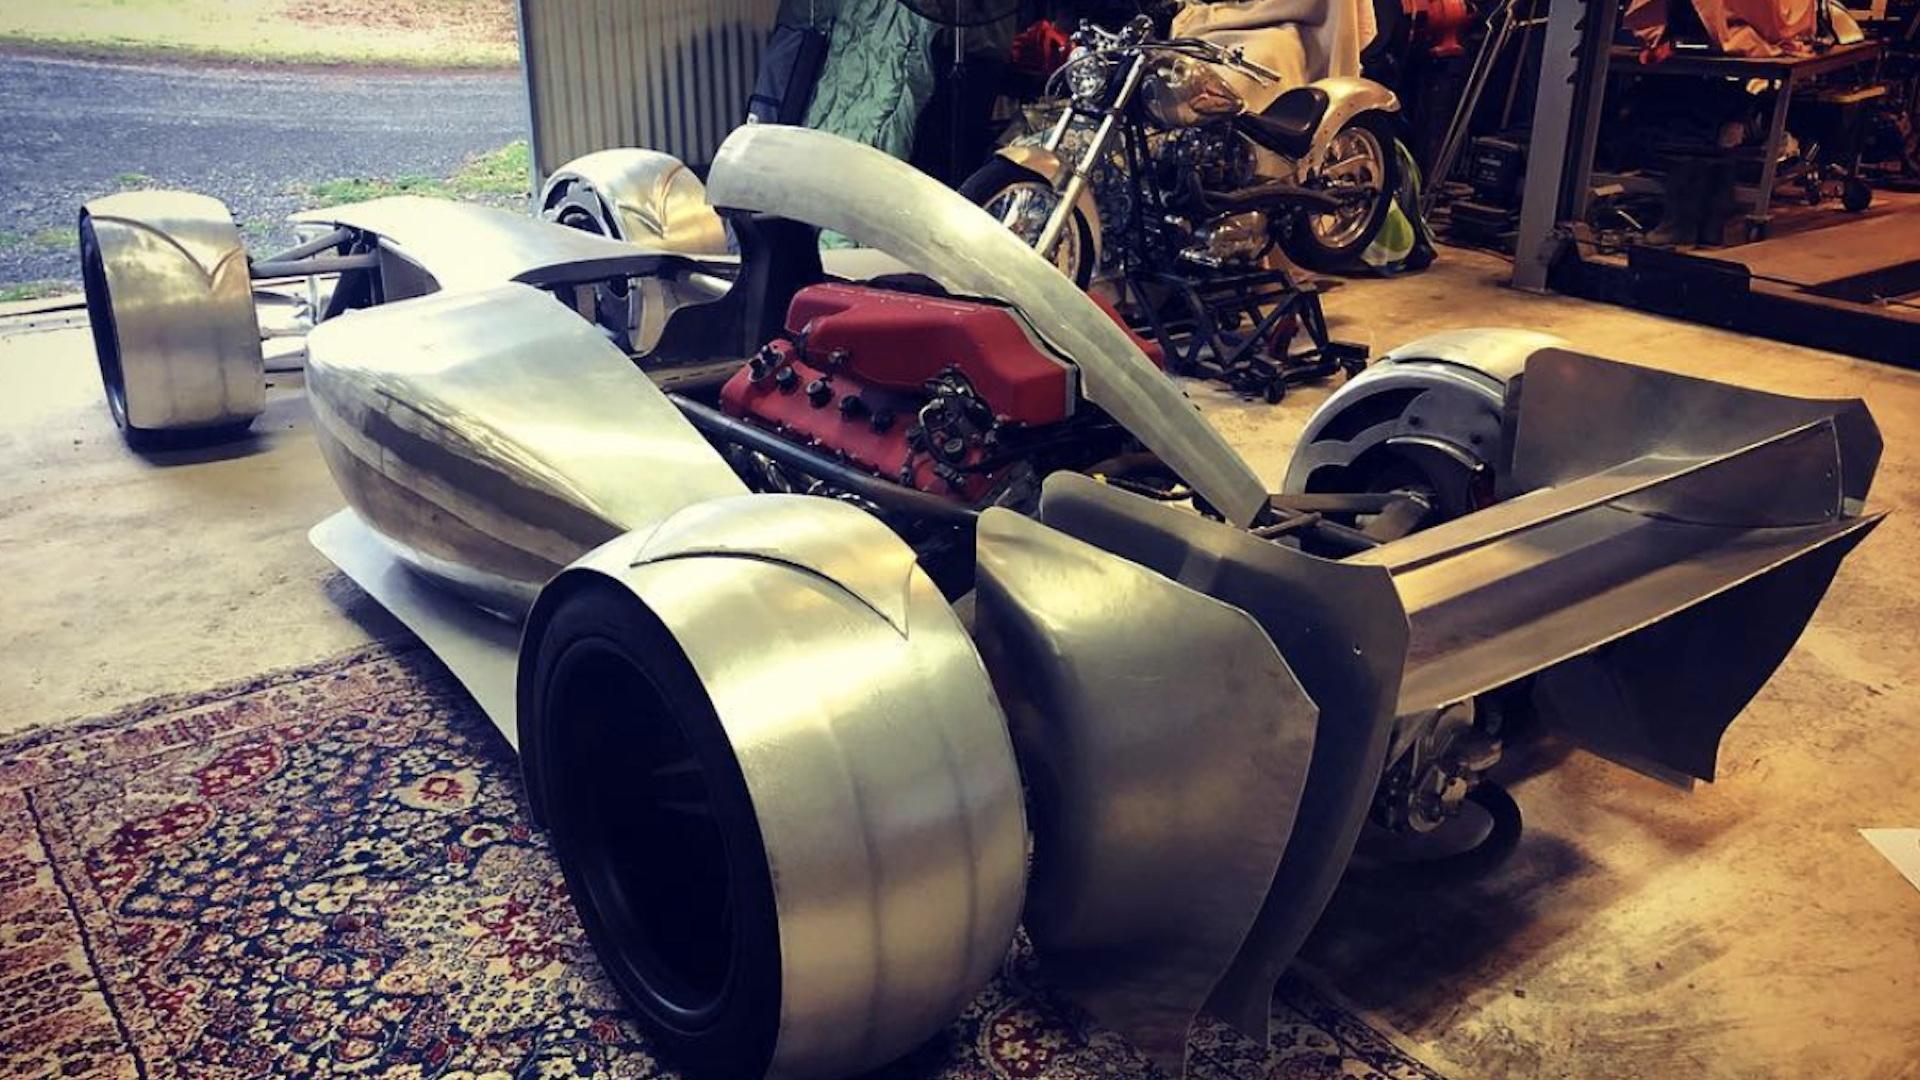 Ferrari-powered F1 car for the street Photo: Zacariasupercars